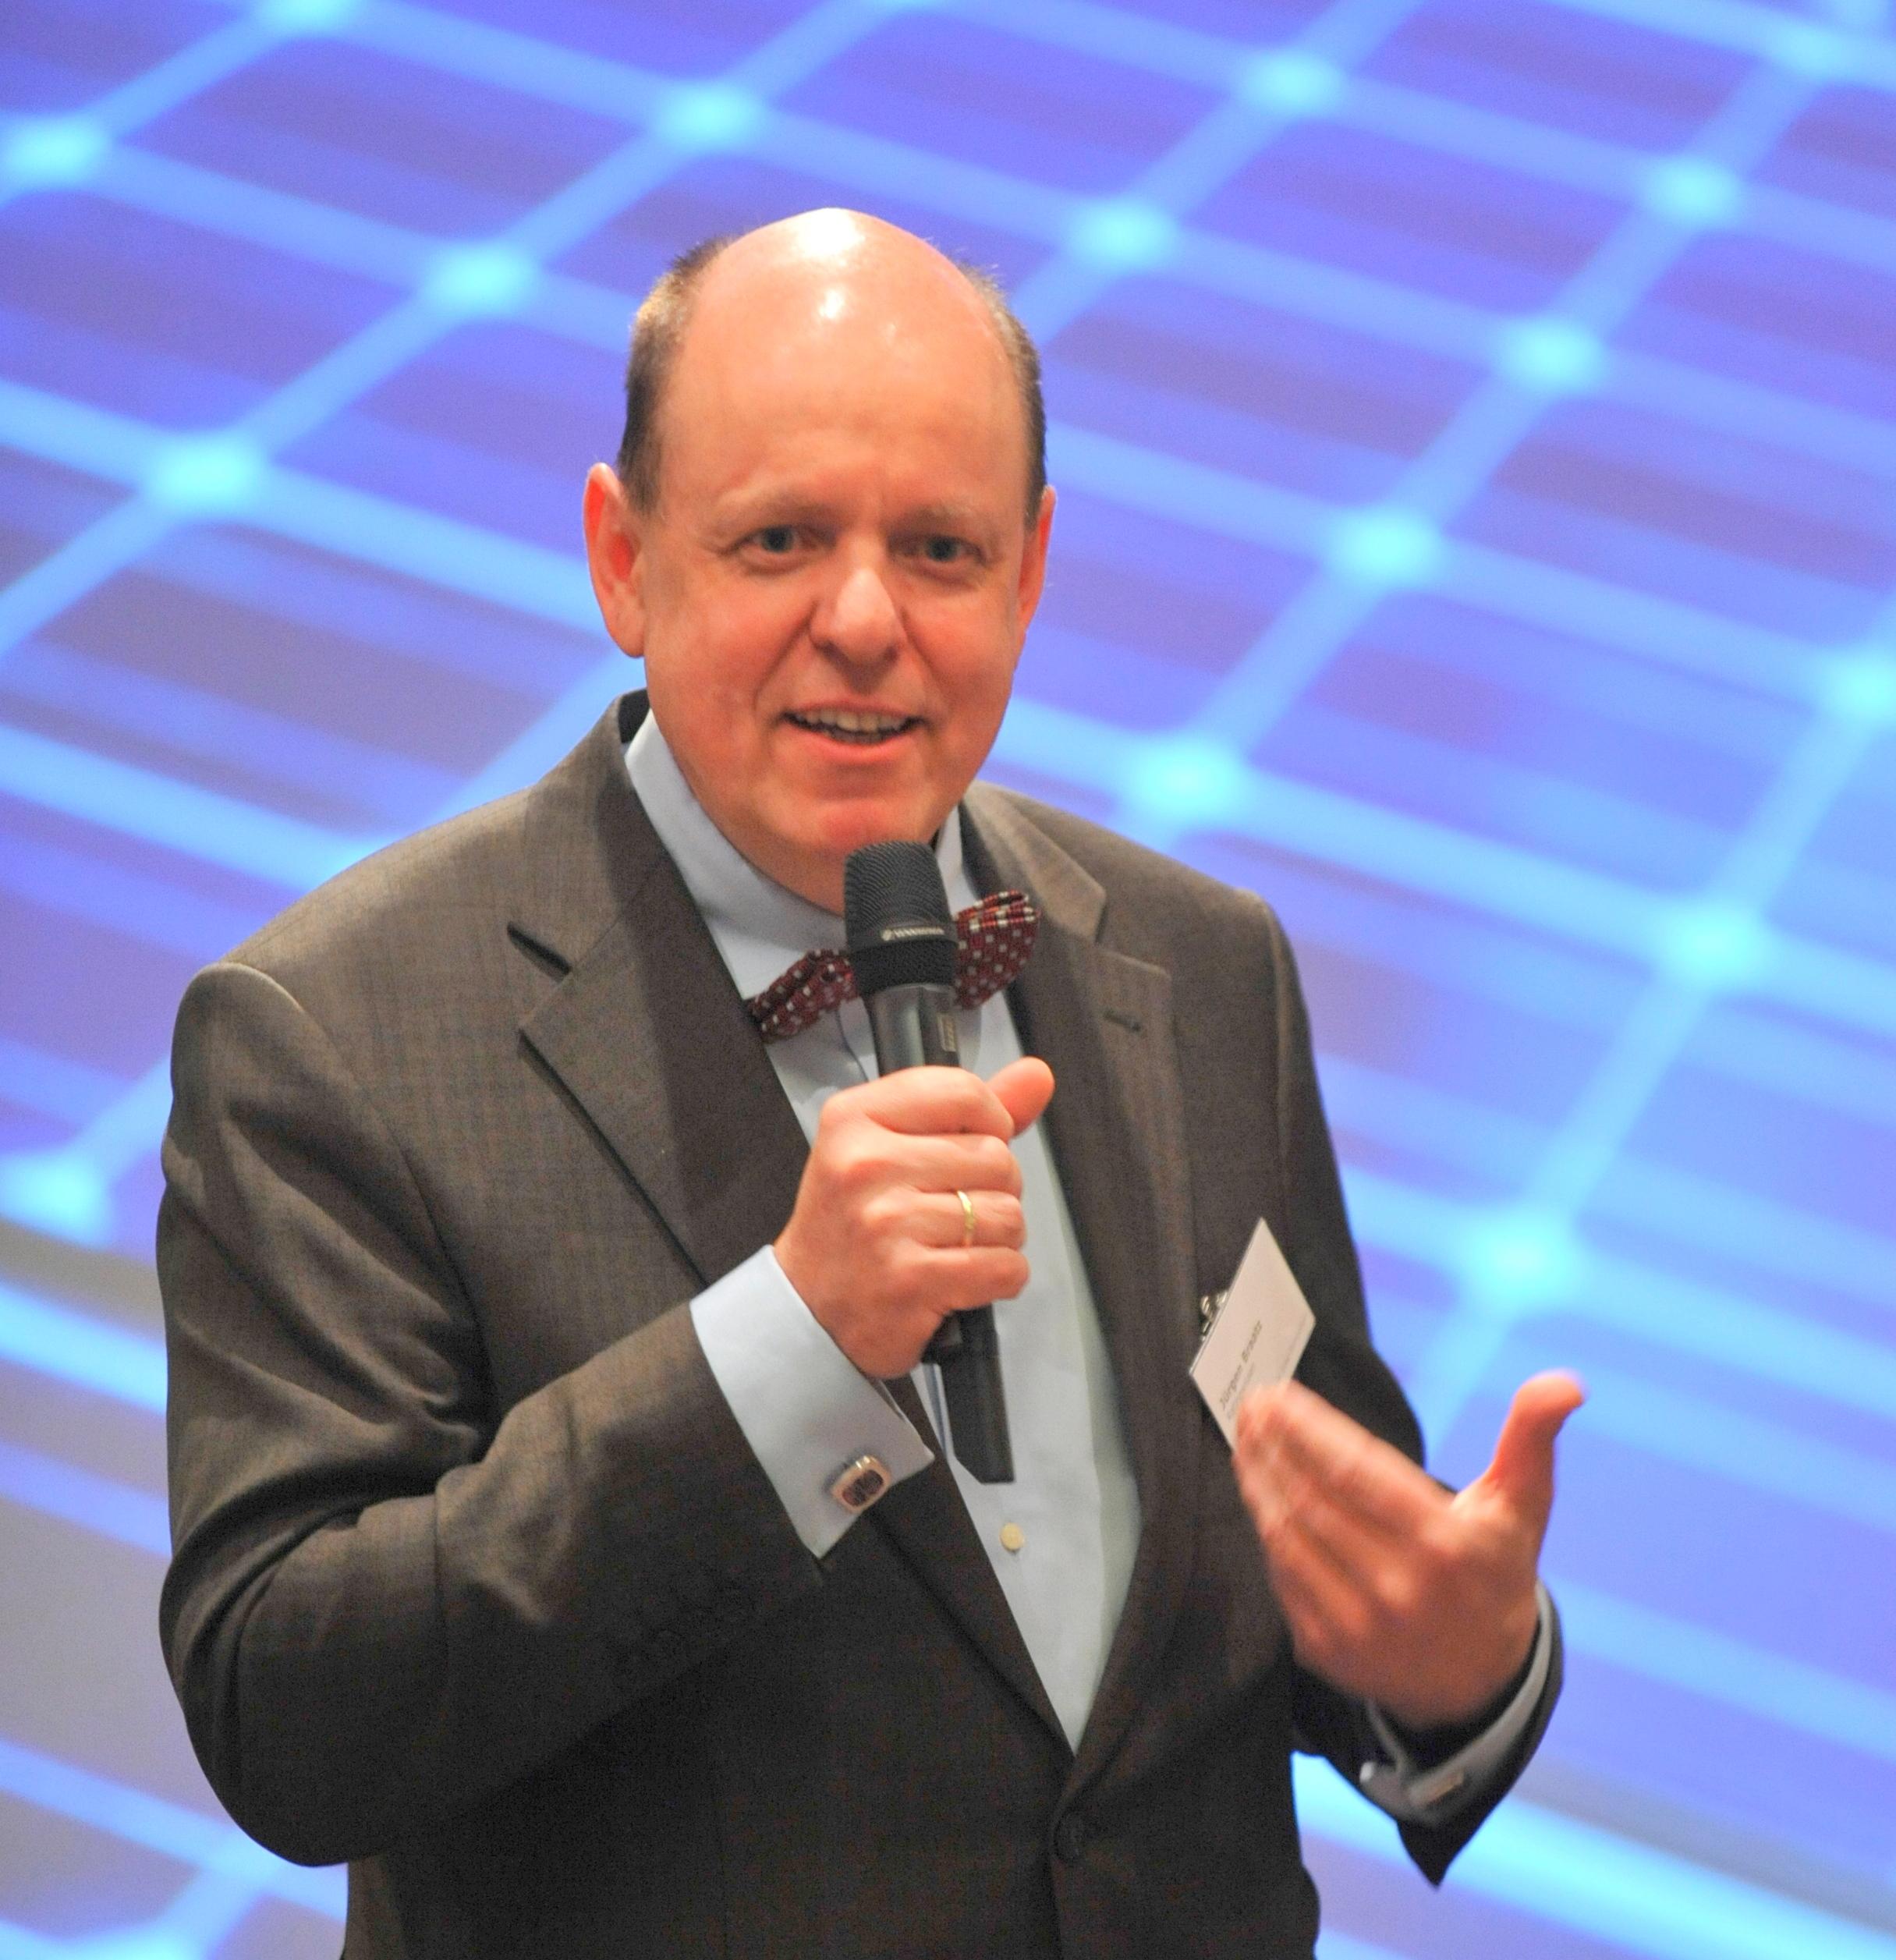 Jürgen_Braatz